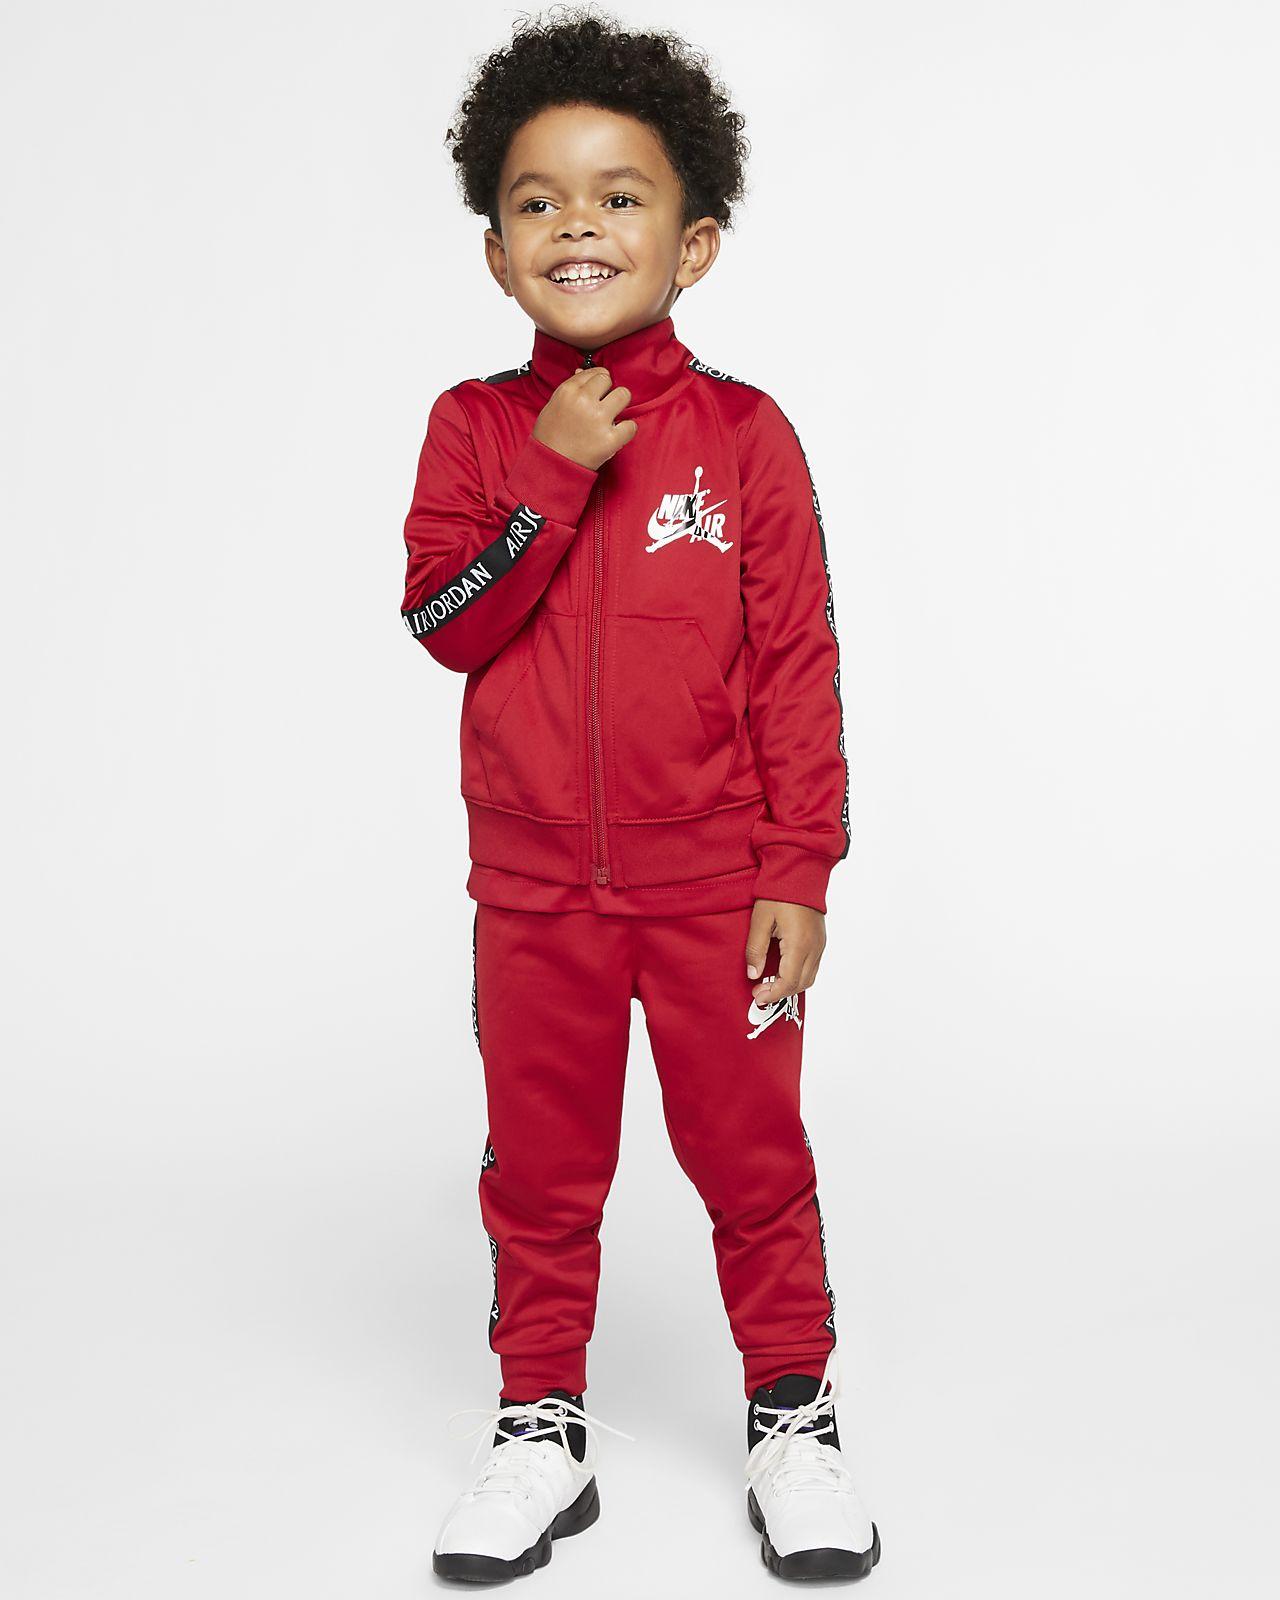 Zestaw bluza i spodnie dla maluchów Jordan Jumpman Classics